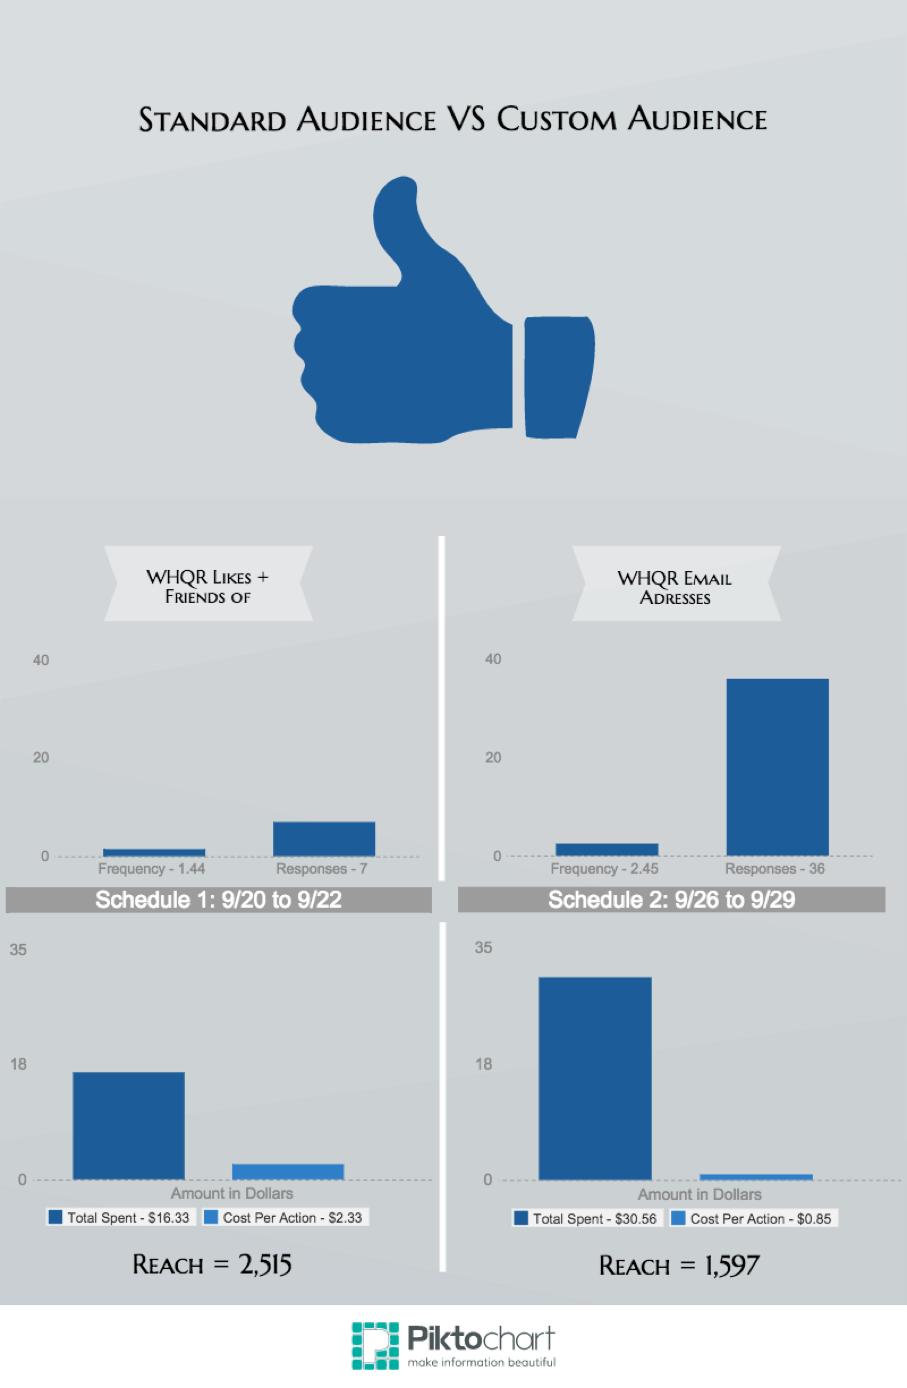 Standard Audience vs. Custom Audience